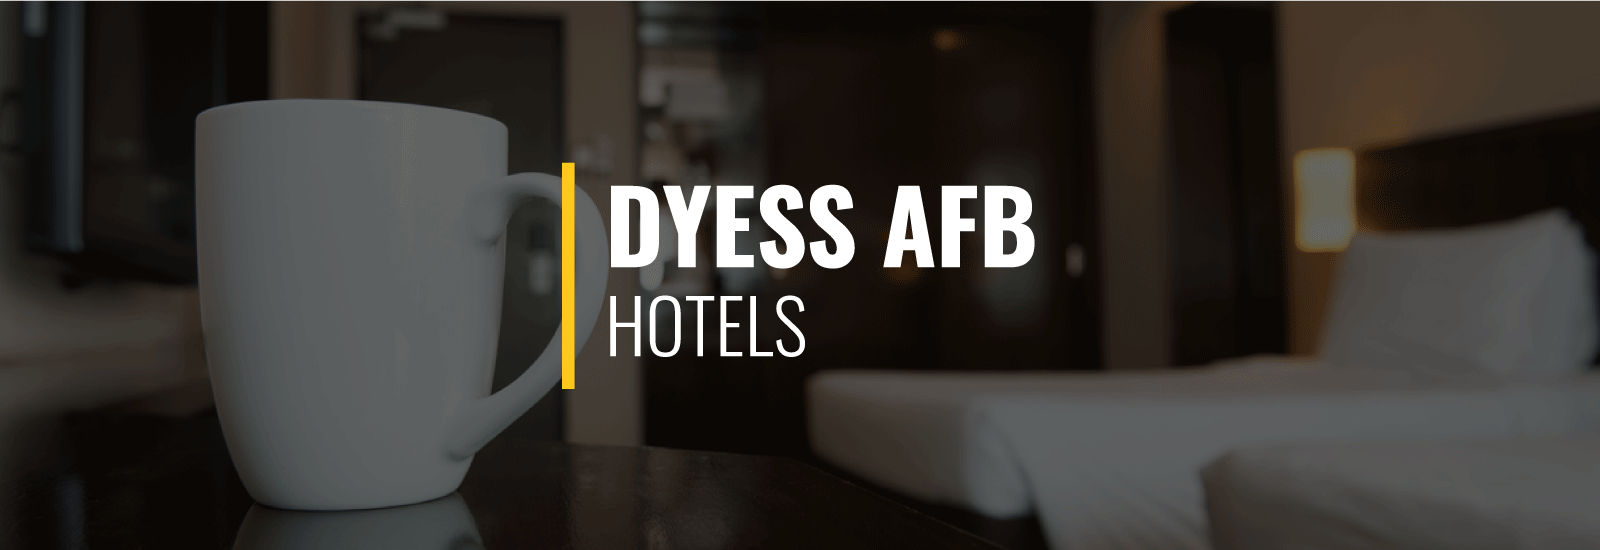 Dyess AFB Hotels